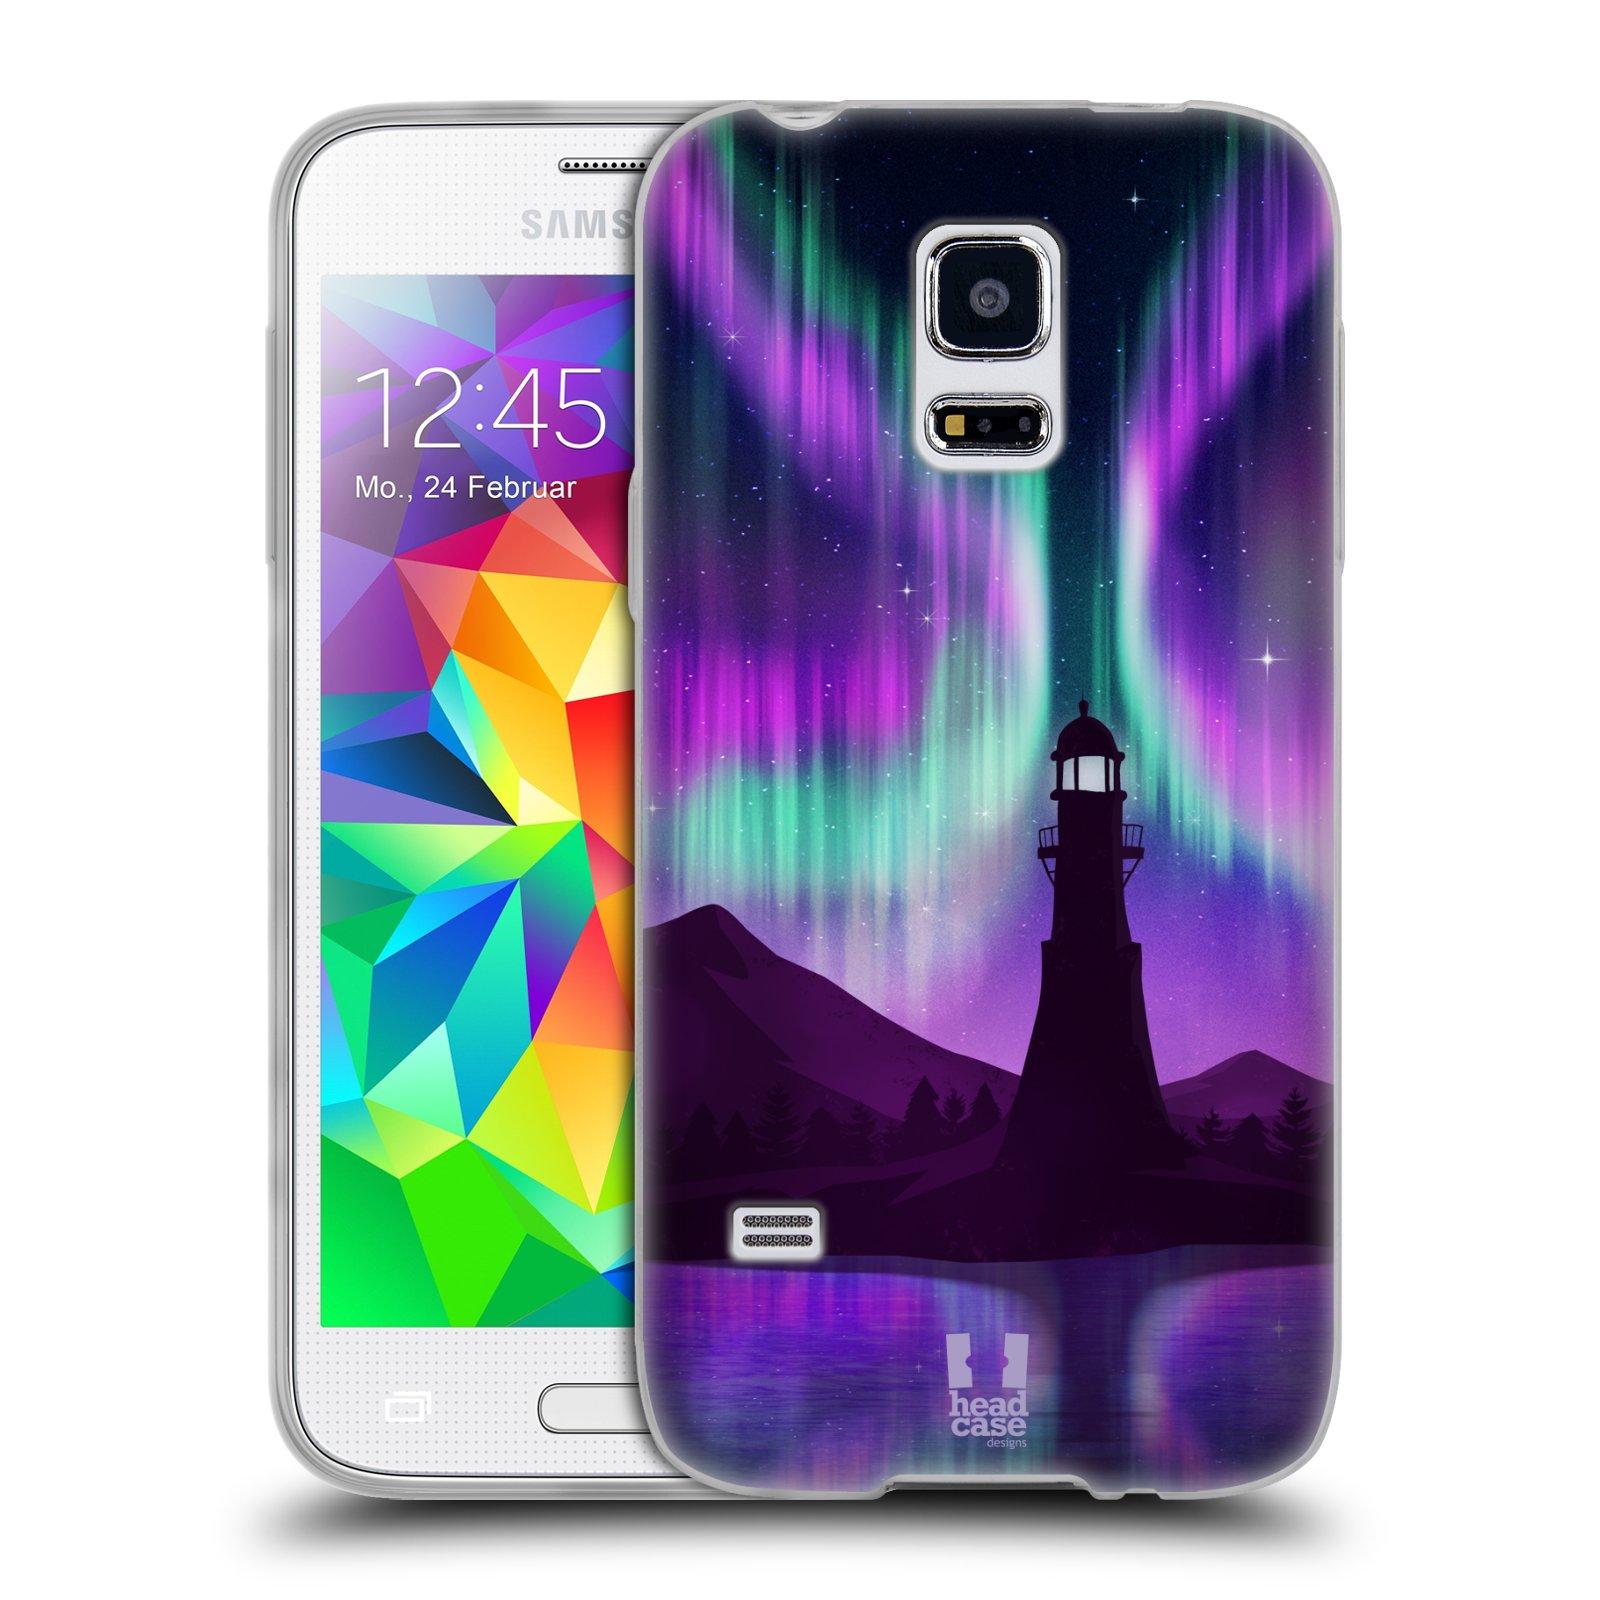 Silikonové pouzdro na mobil Samsung Galaxy S5 Mini HEAD CASE Polární Záře Maják (Silikonový kryt či obal na mobilní telefon Samsung Galaxy S5 Mini SM-G800F)